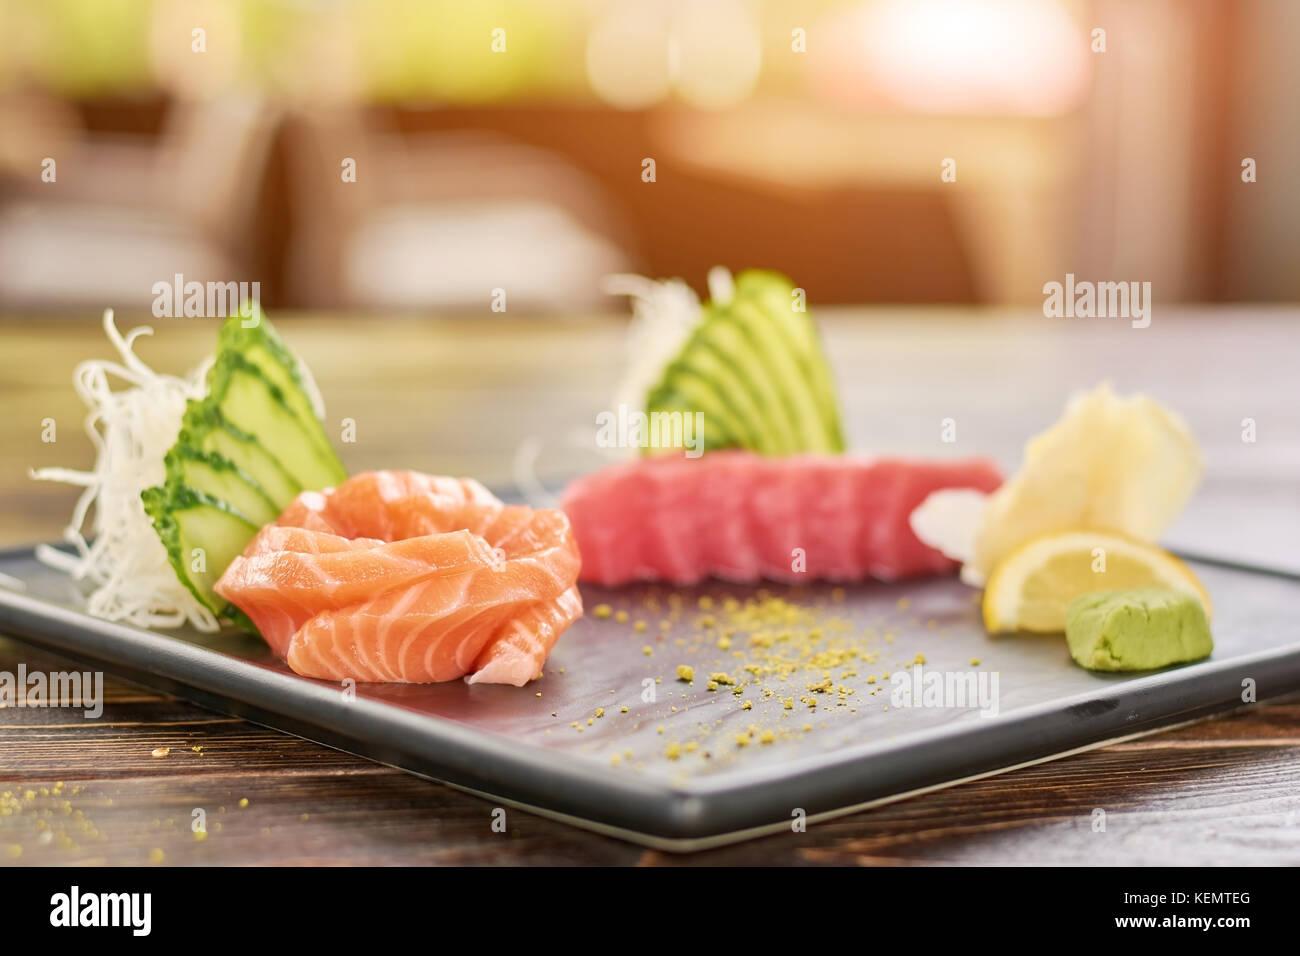 Fresh fish sashimi set. Raw salmon and tuna sashimi served with cucumber, salmon and wasabi. - Stock Image